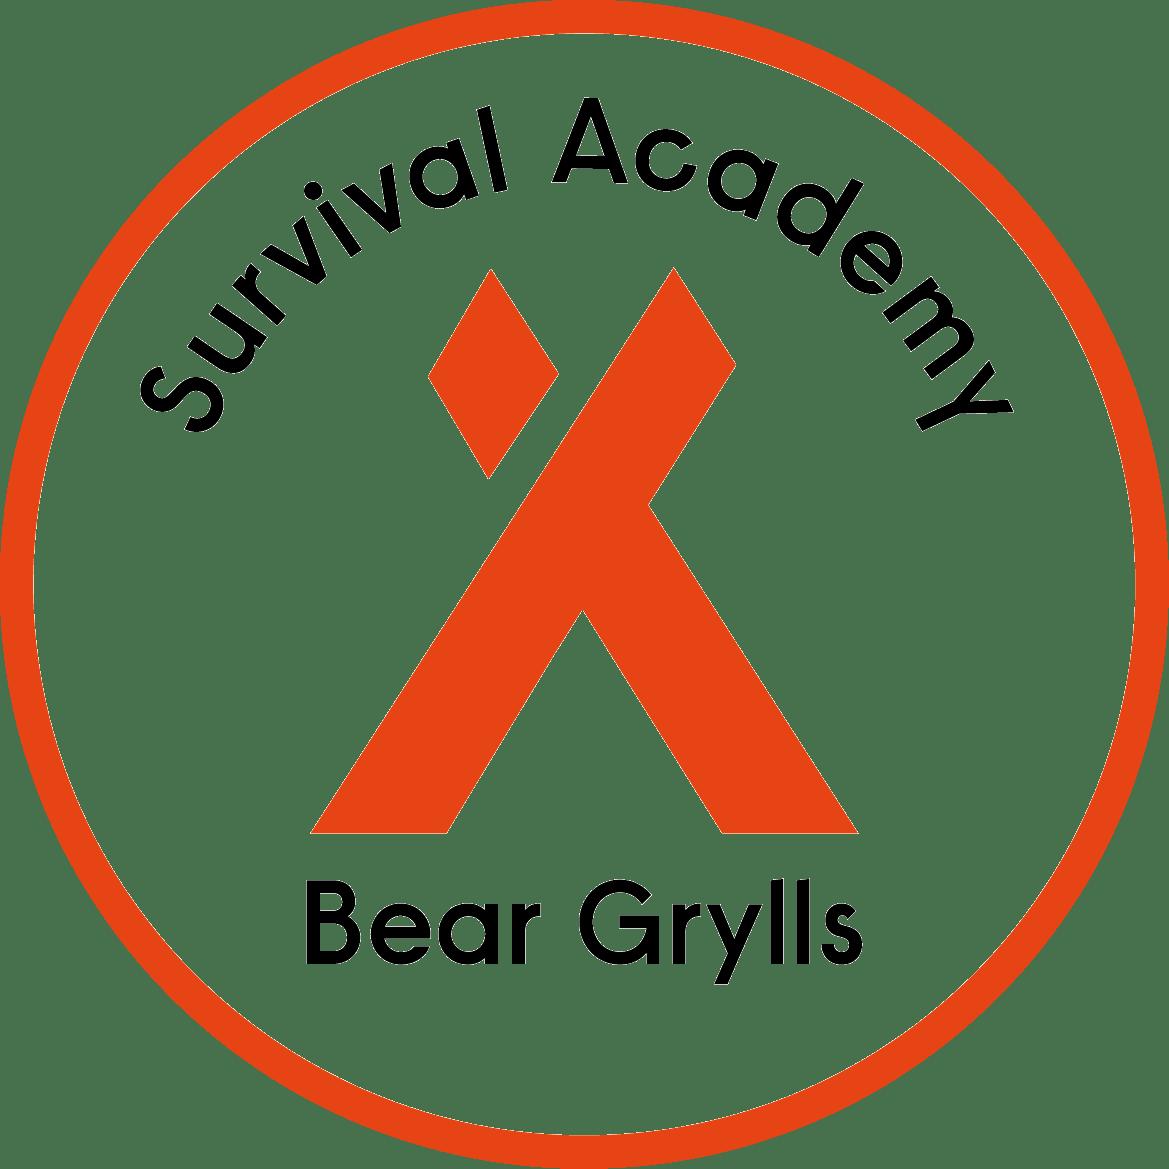 Bear Grylls Survival Academy logo